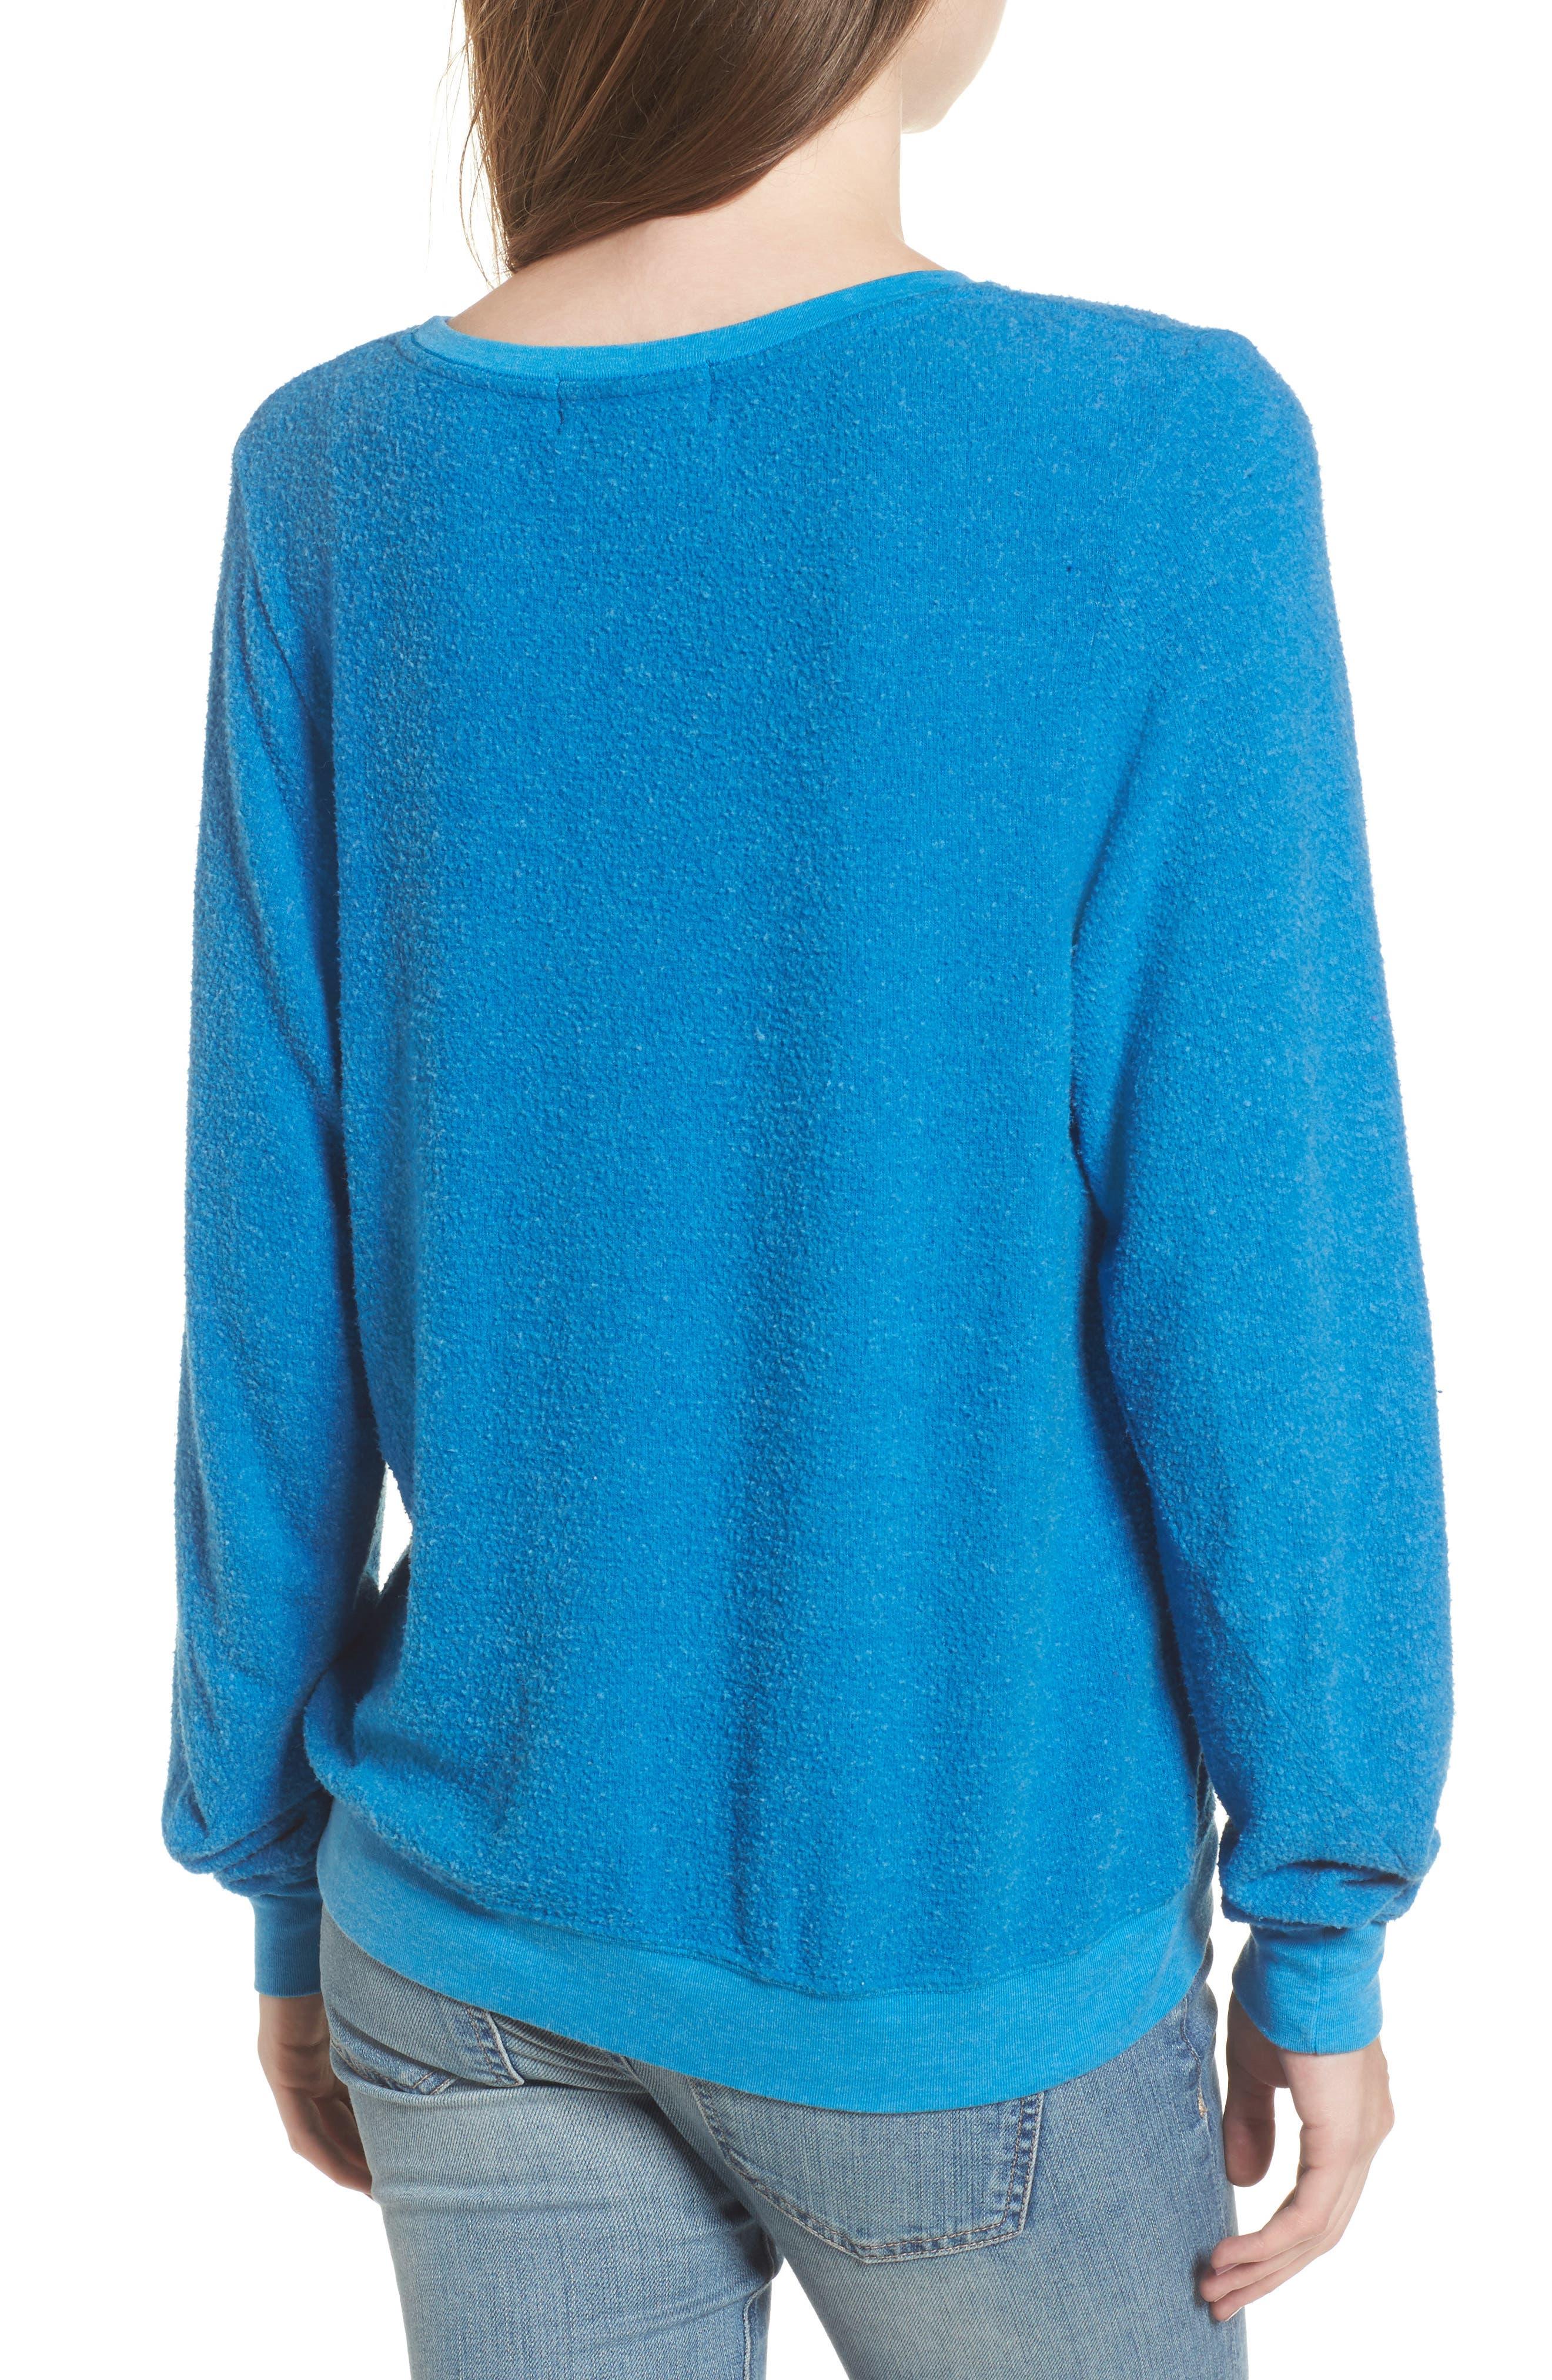 Owl Love You Forever Sweatshirt,                             Alternate thumbnail 2, color,                             401